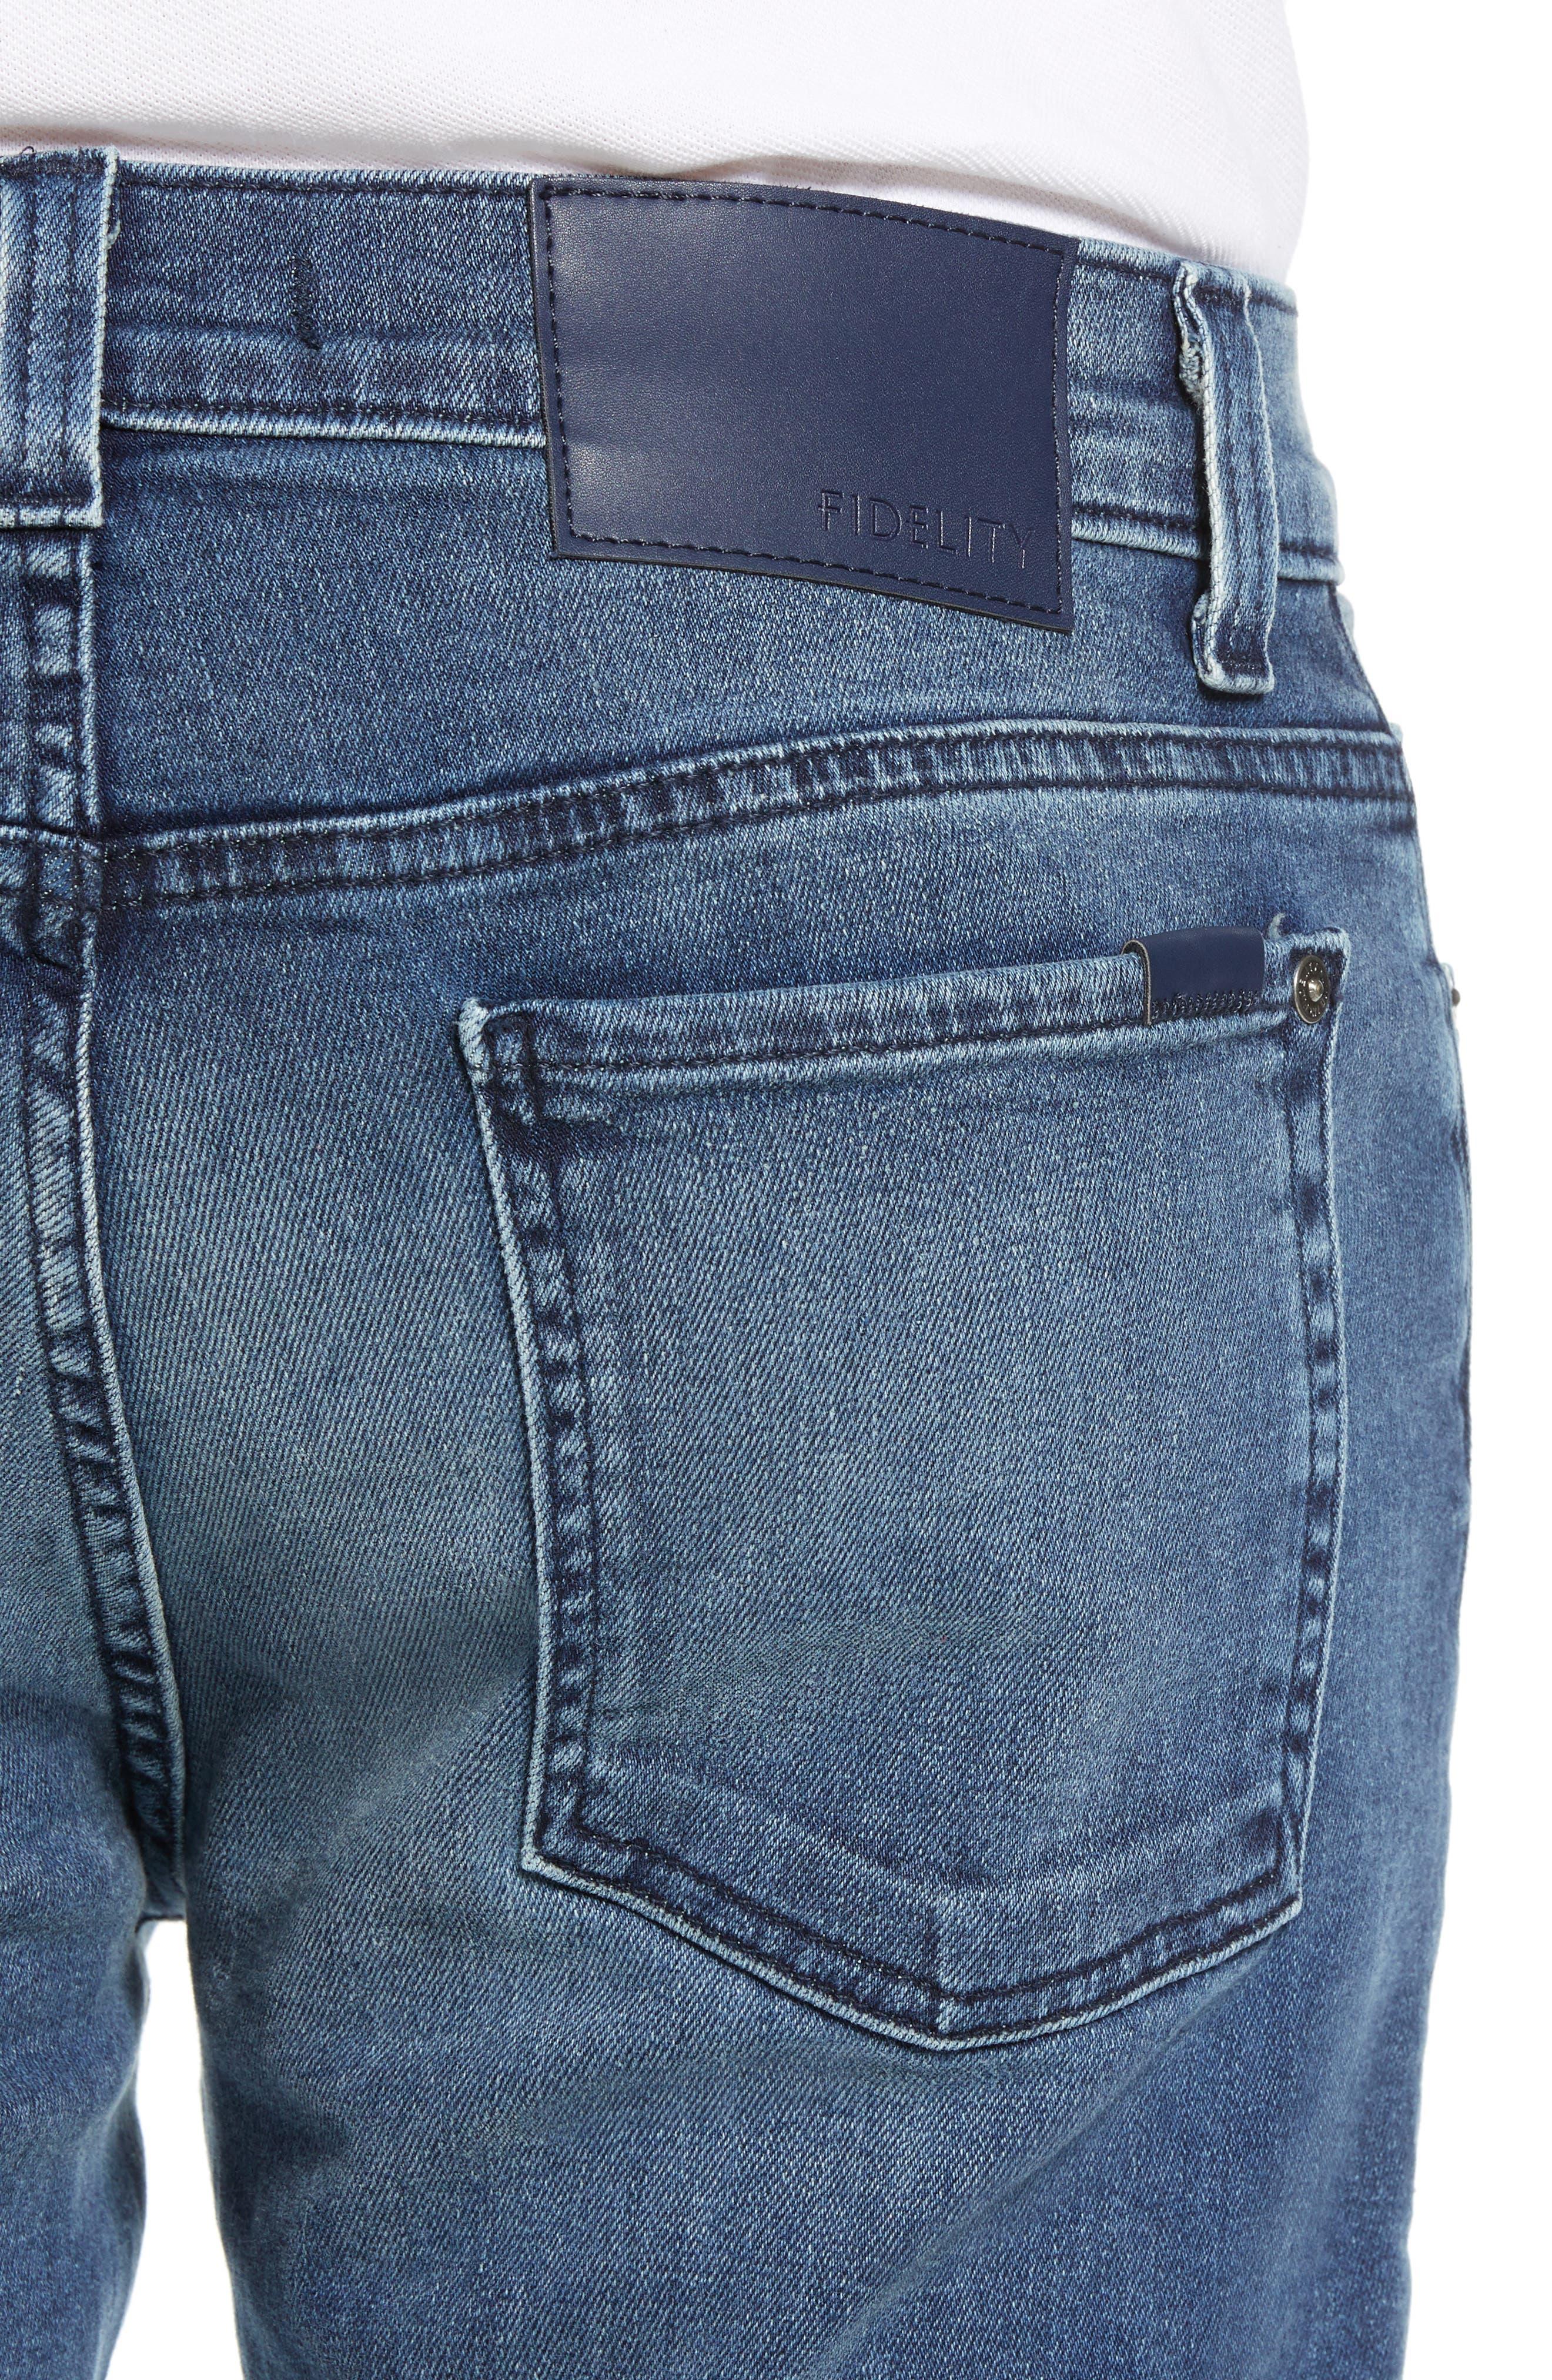 Torino Slim Fit Jeans,                             Alternate thumbnail 4, color,                             EMPIRE BLUE